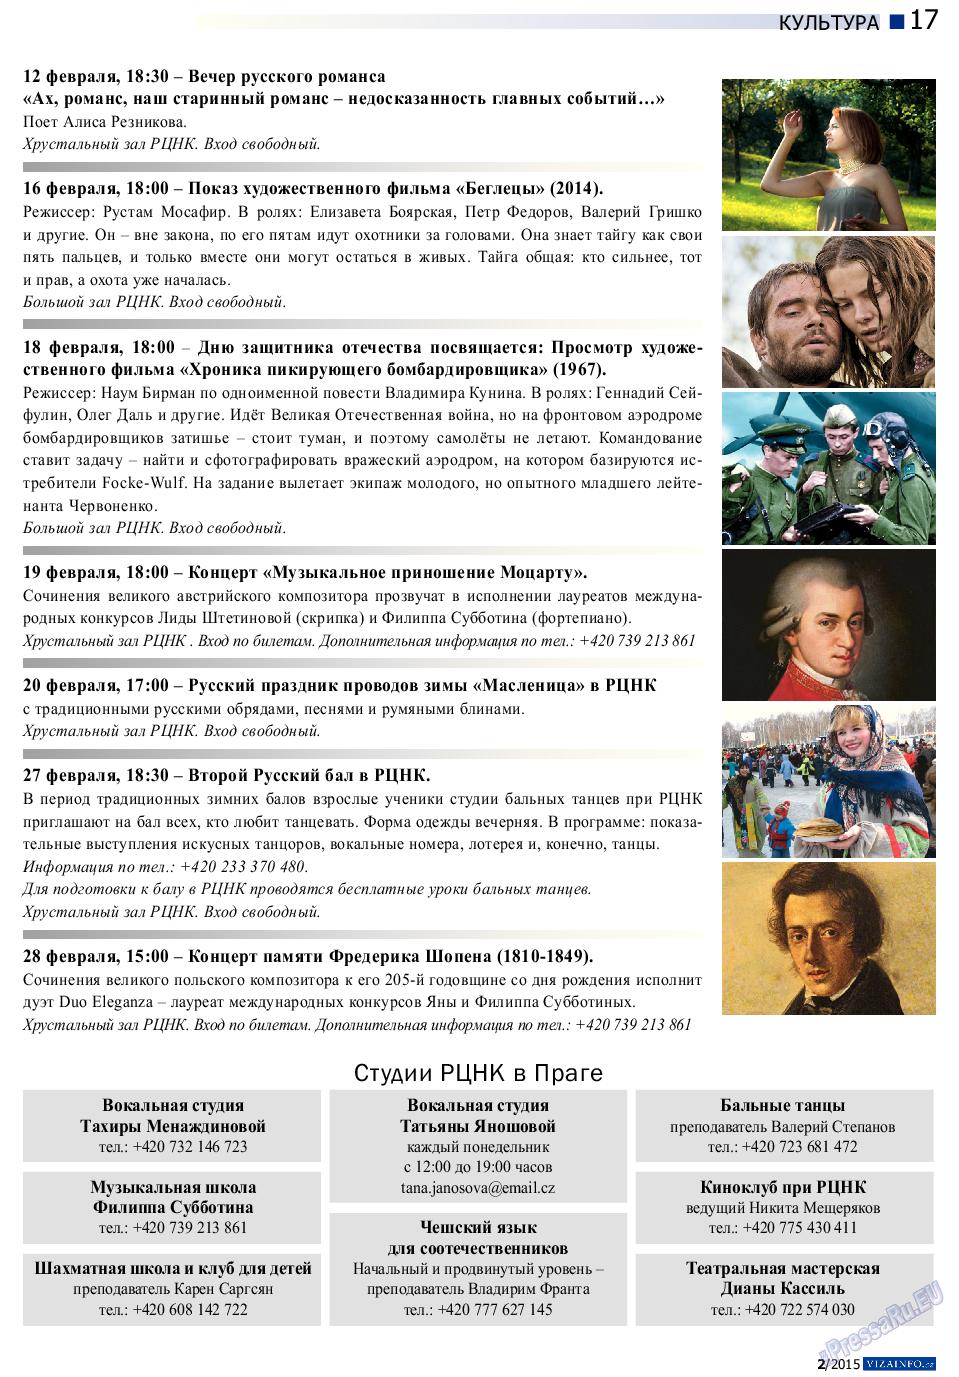 Vizainfo.cz (газета). 2015 год, номер 65, стр. 17